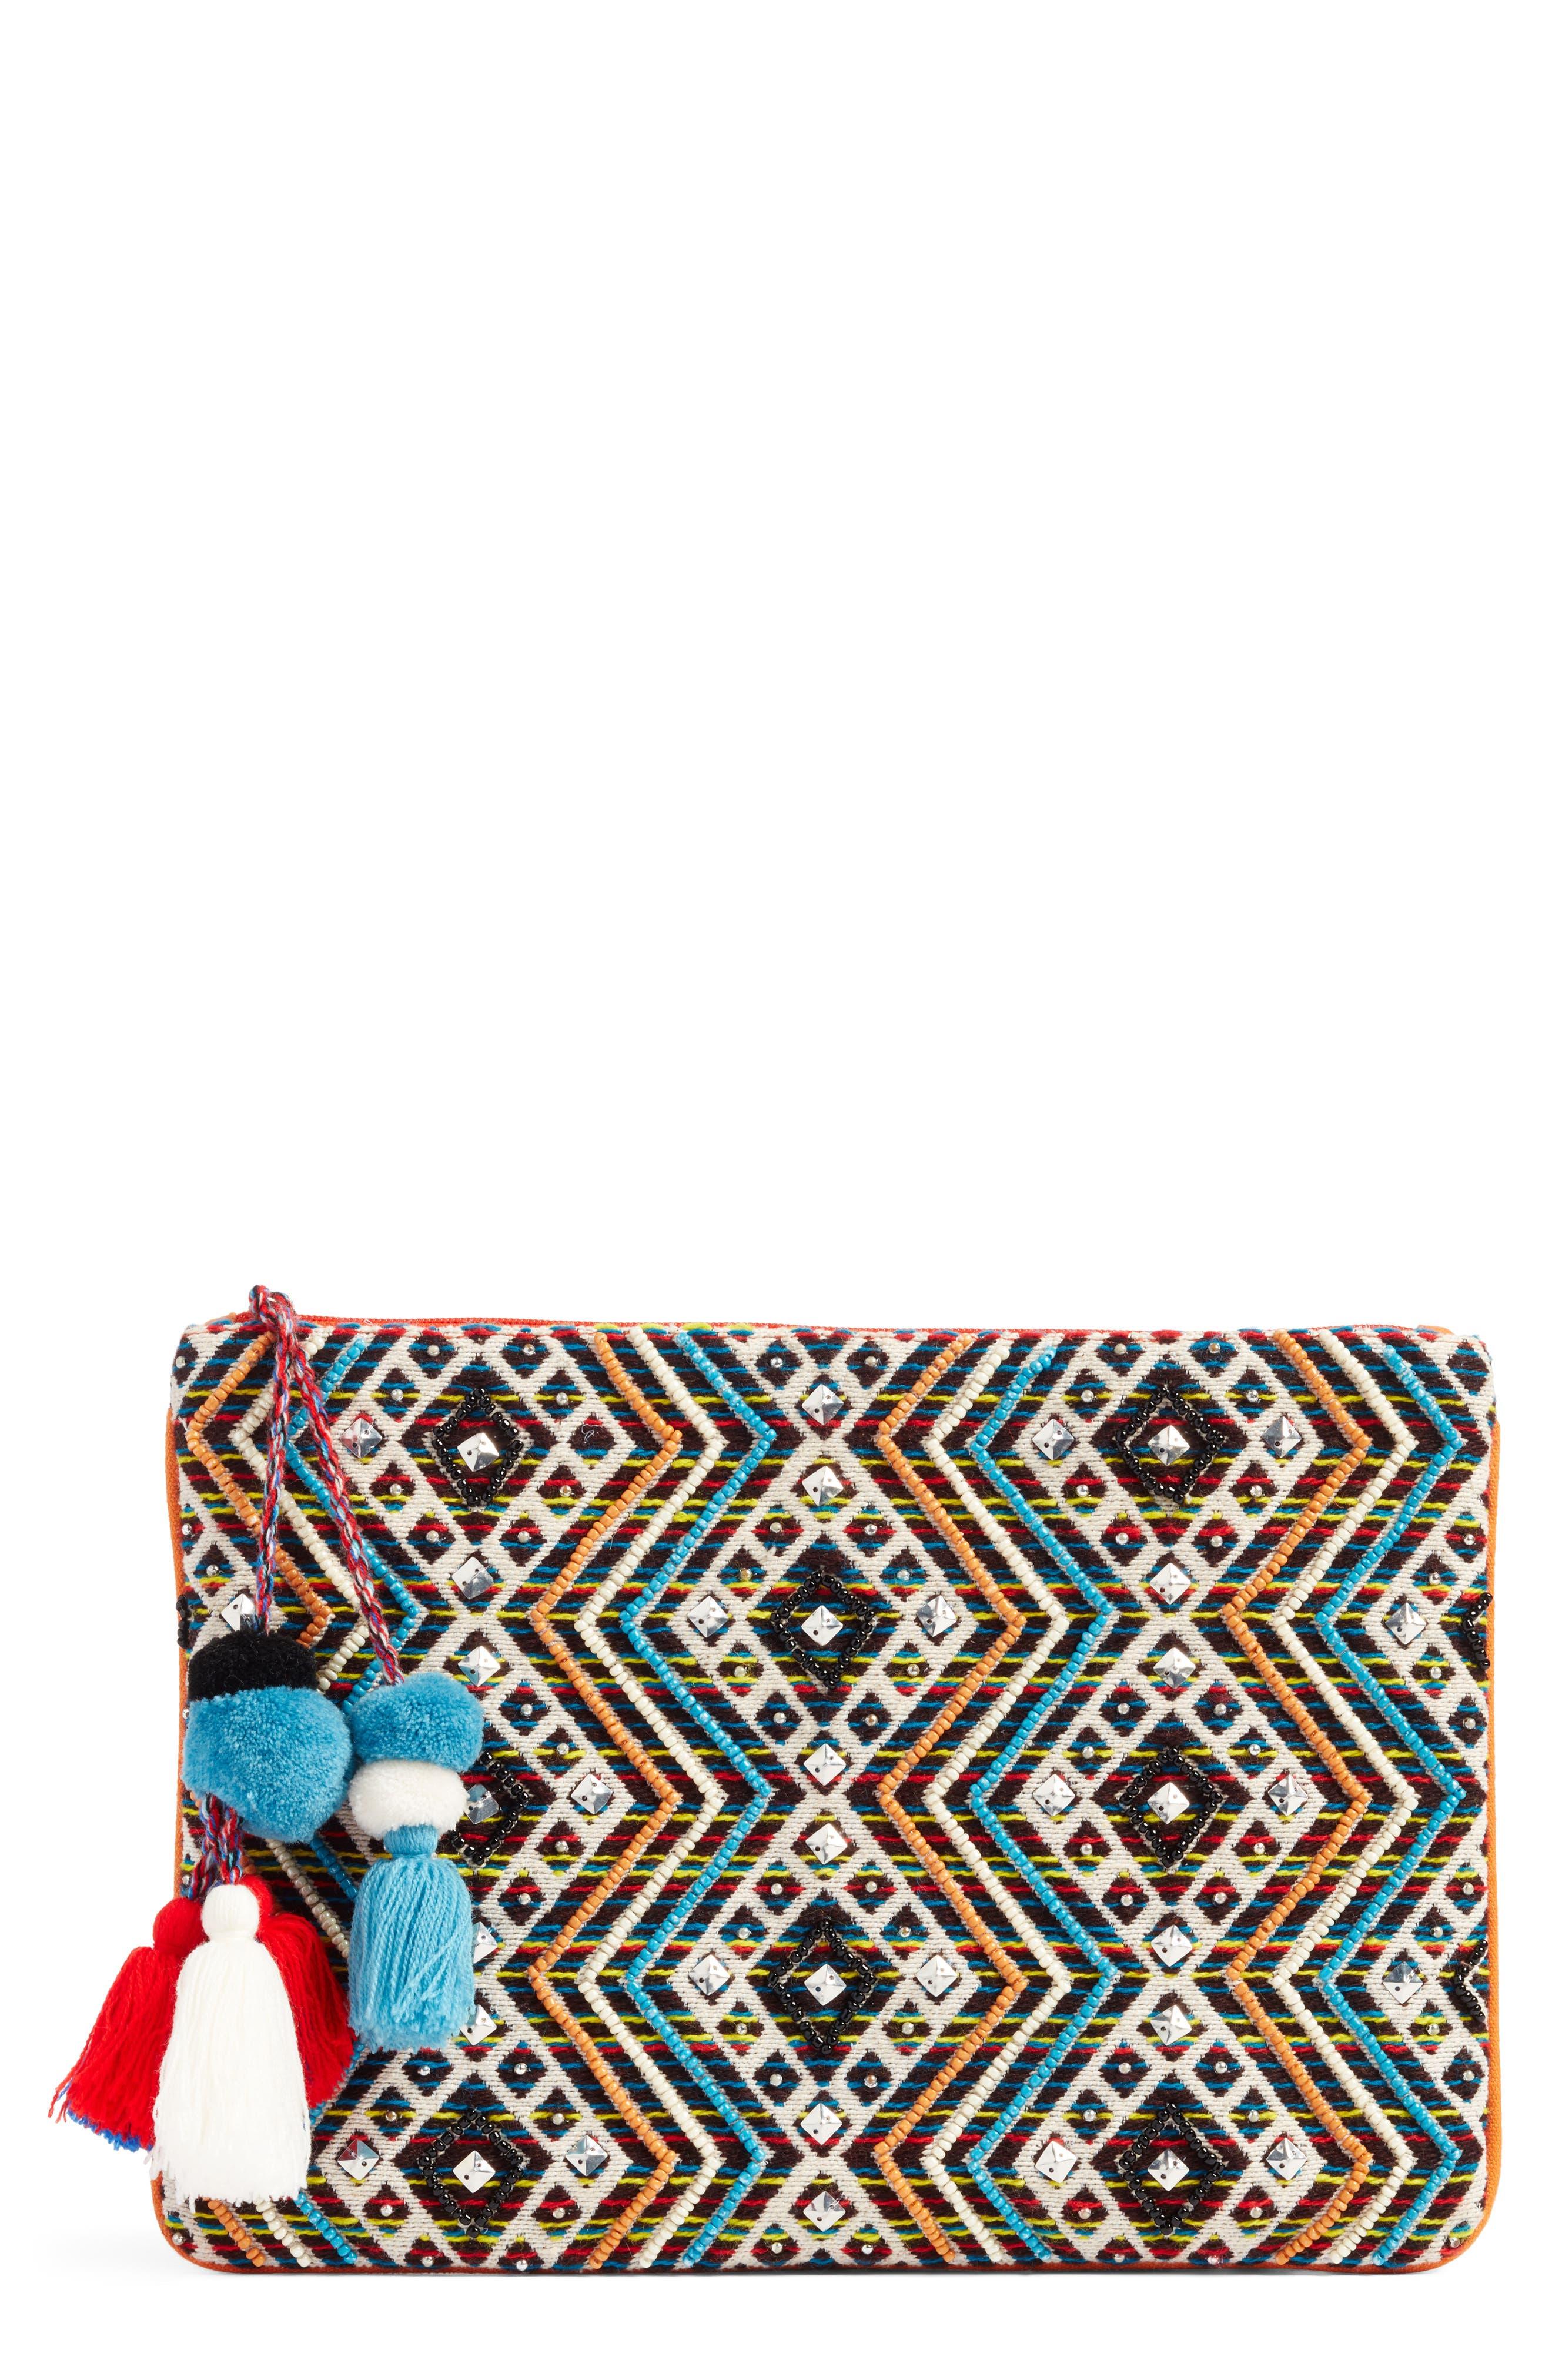 Resort Embellished Clutch,                             Main thumbnail 1, color,                             Blue Multi